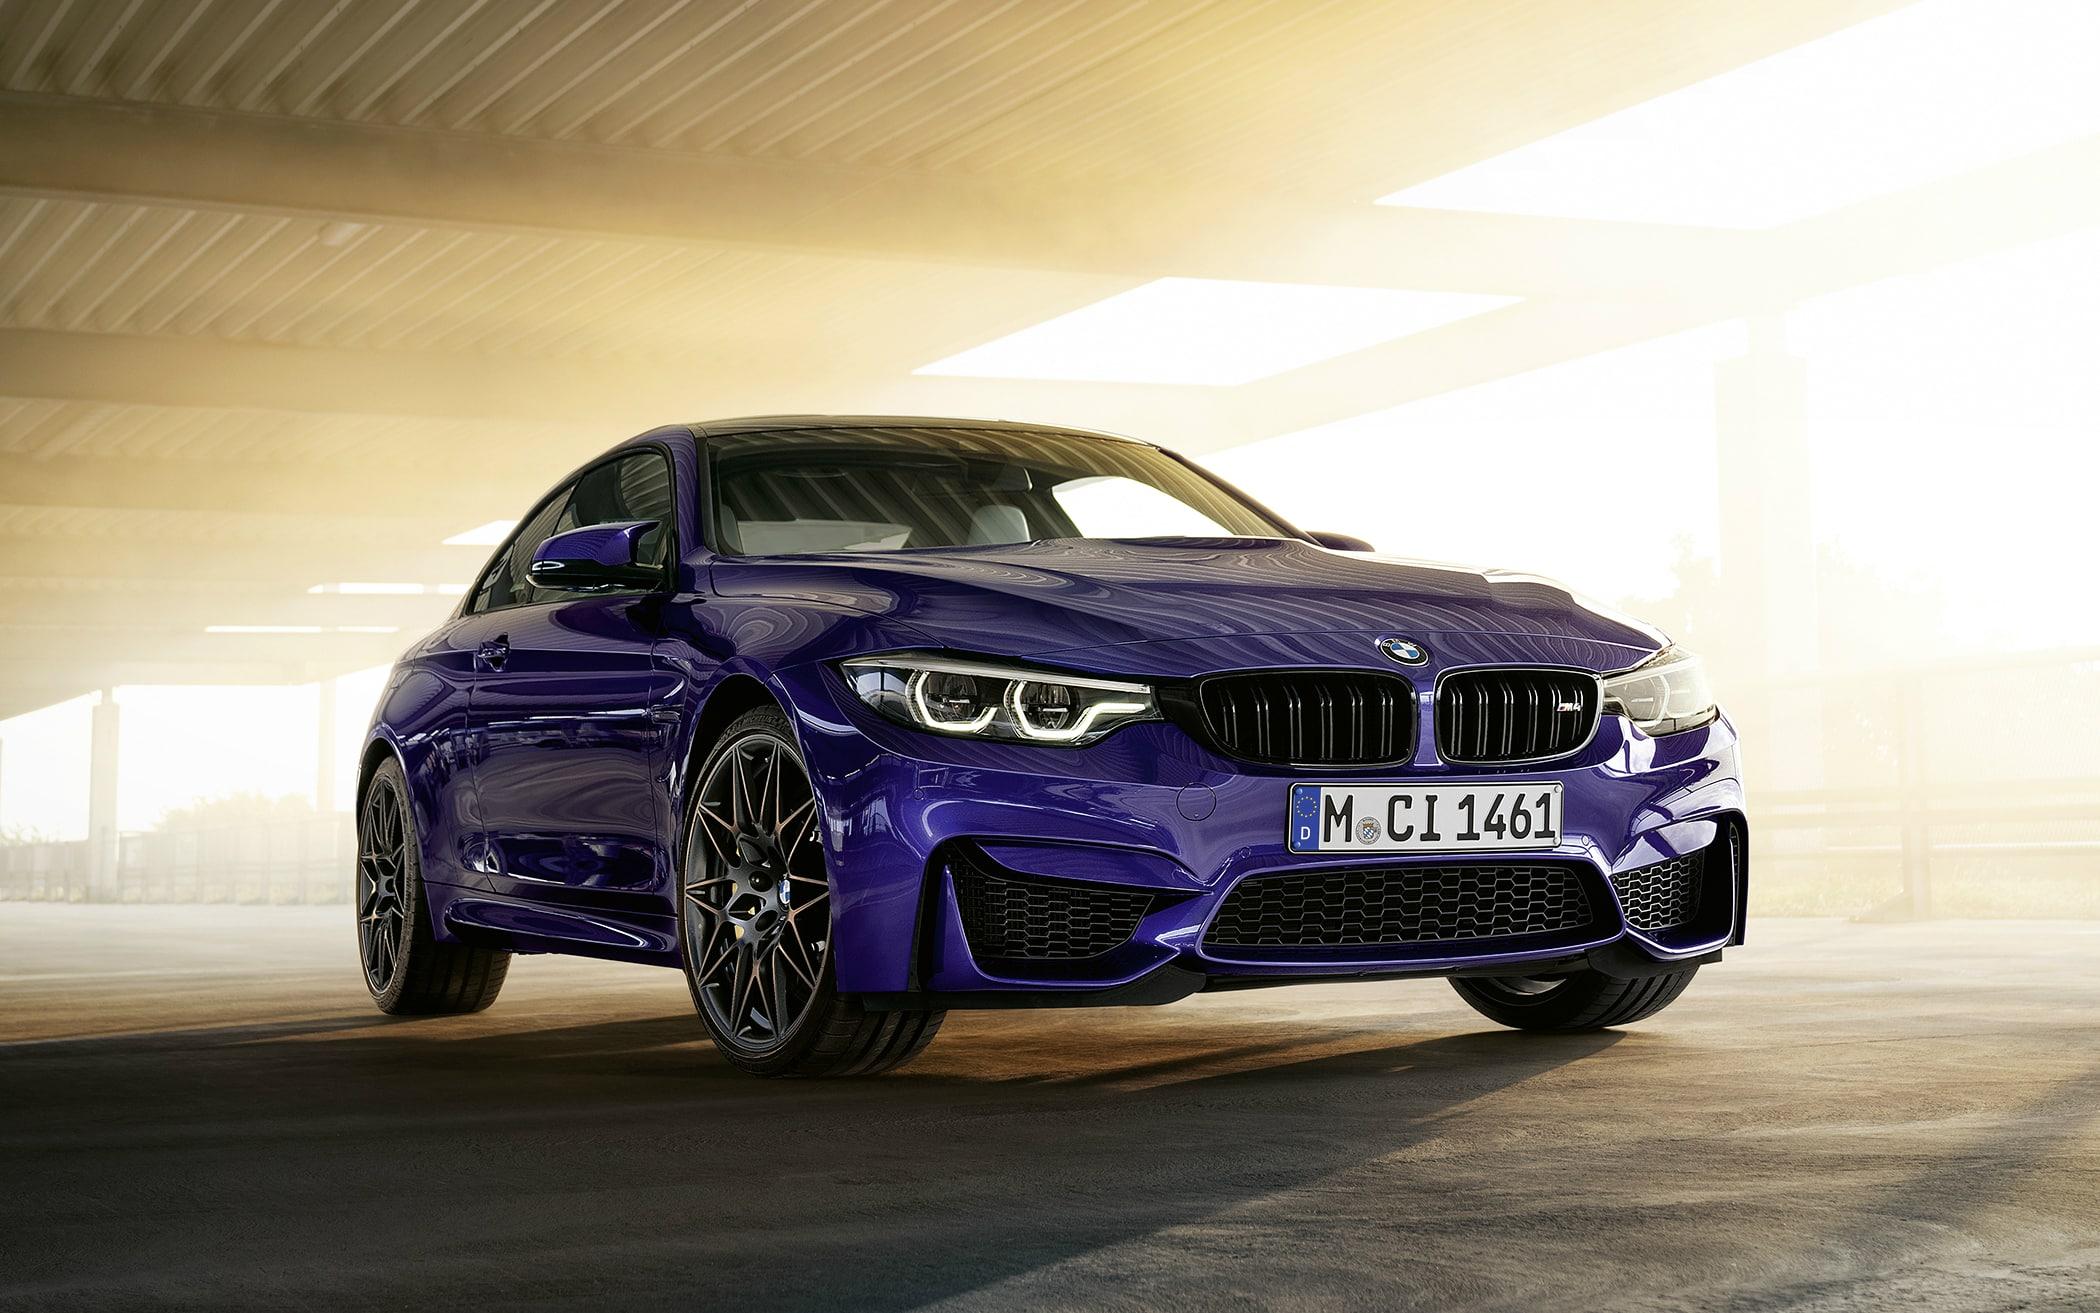 2020 BMW M4 Edition M Heritage